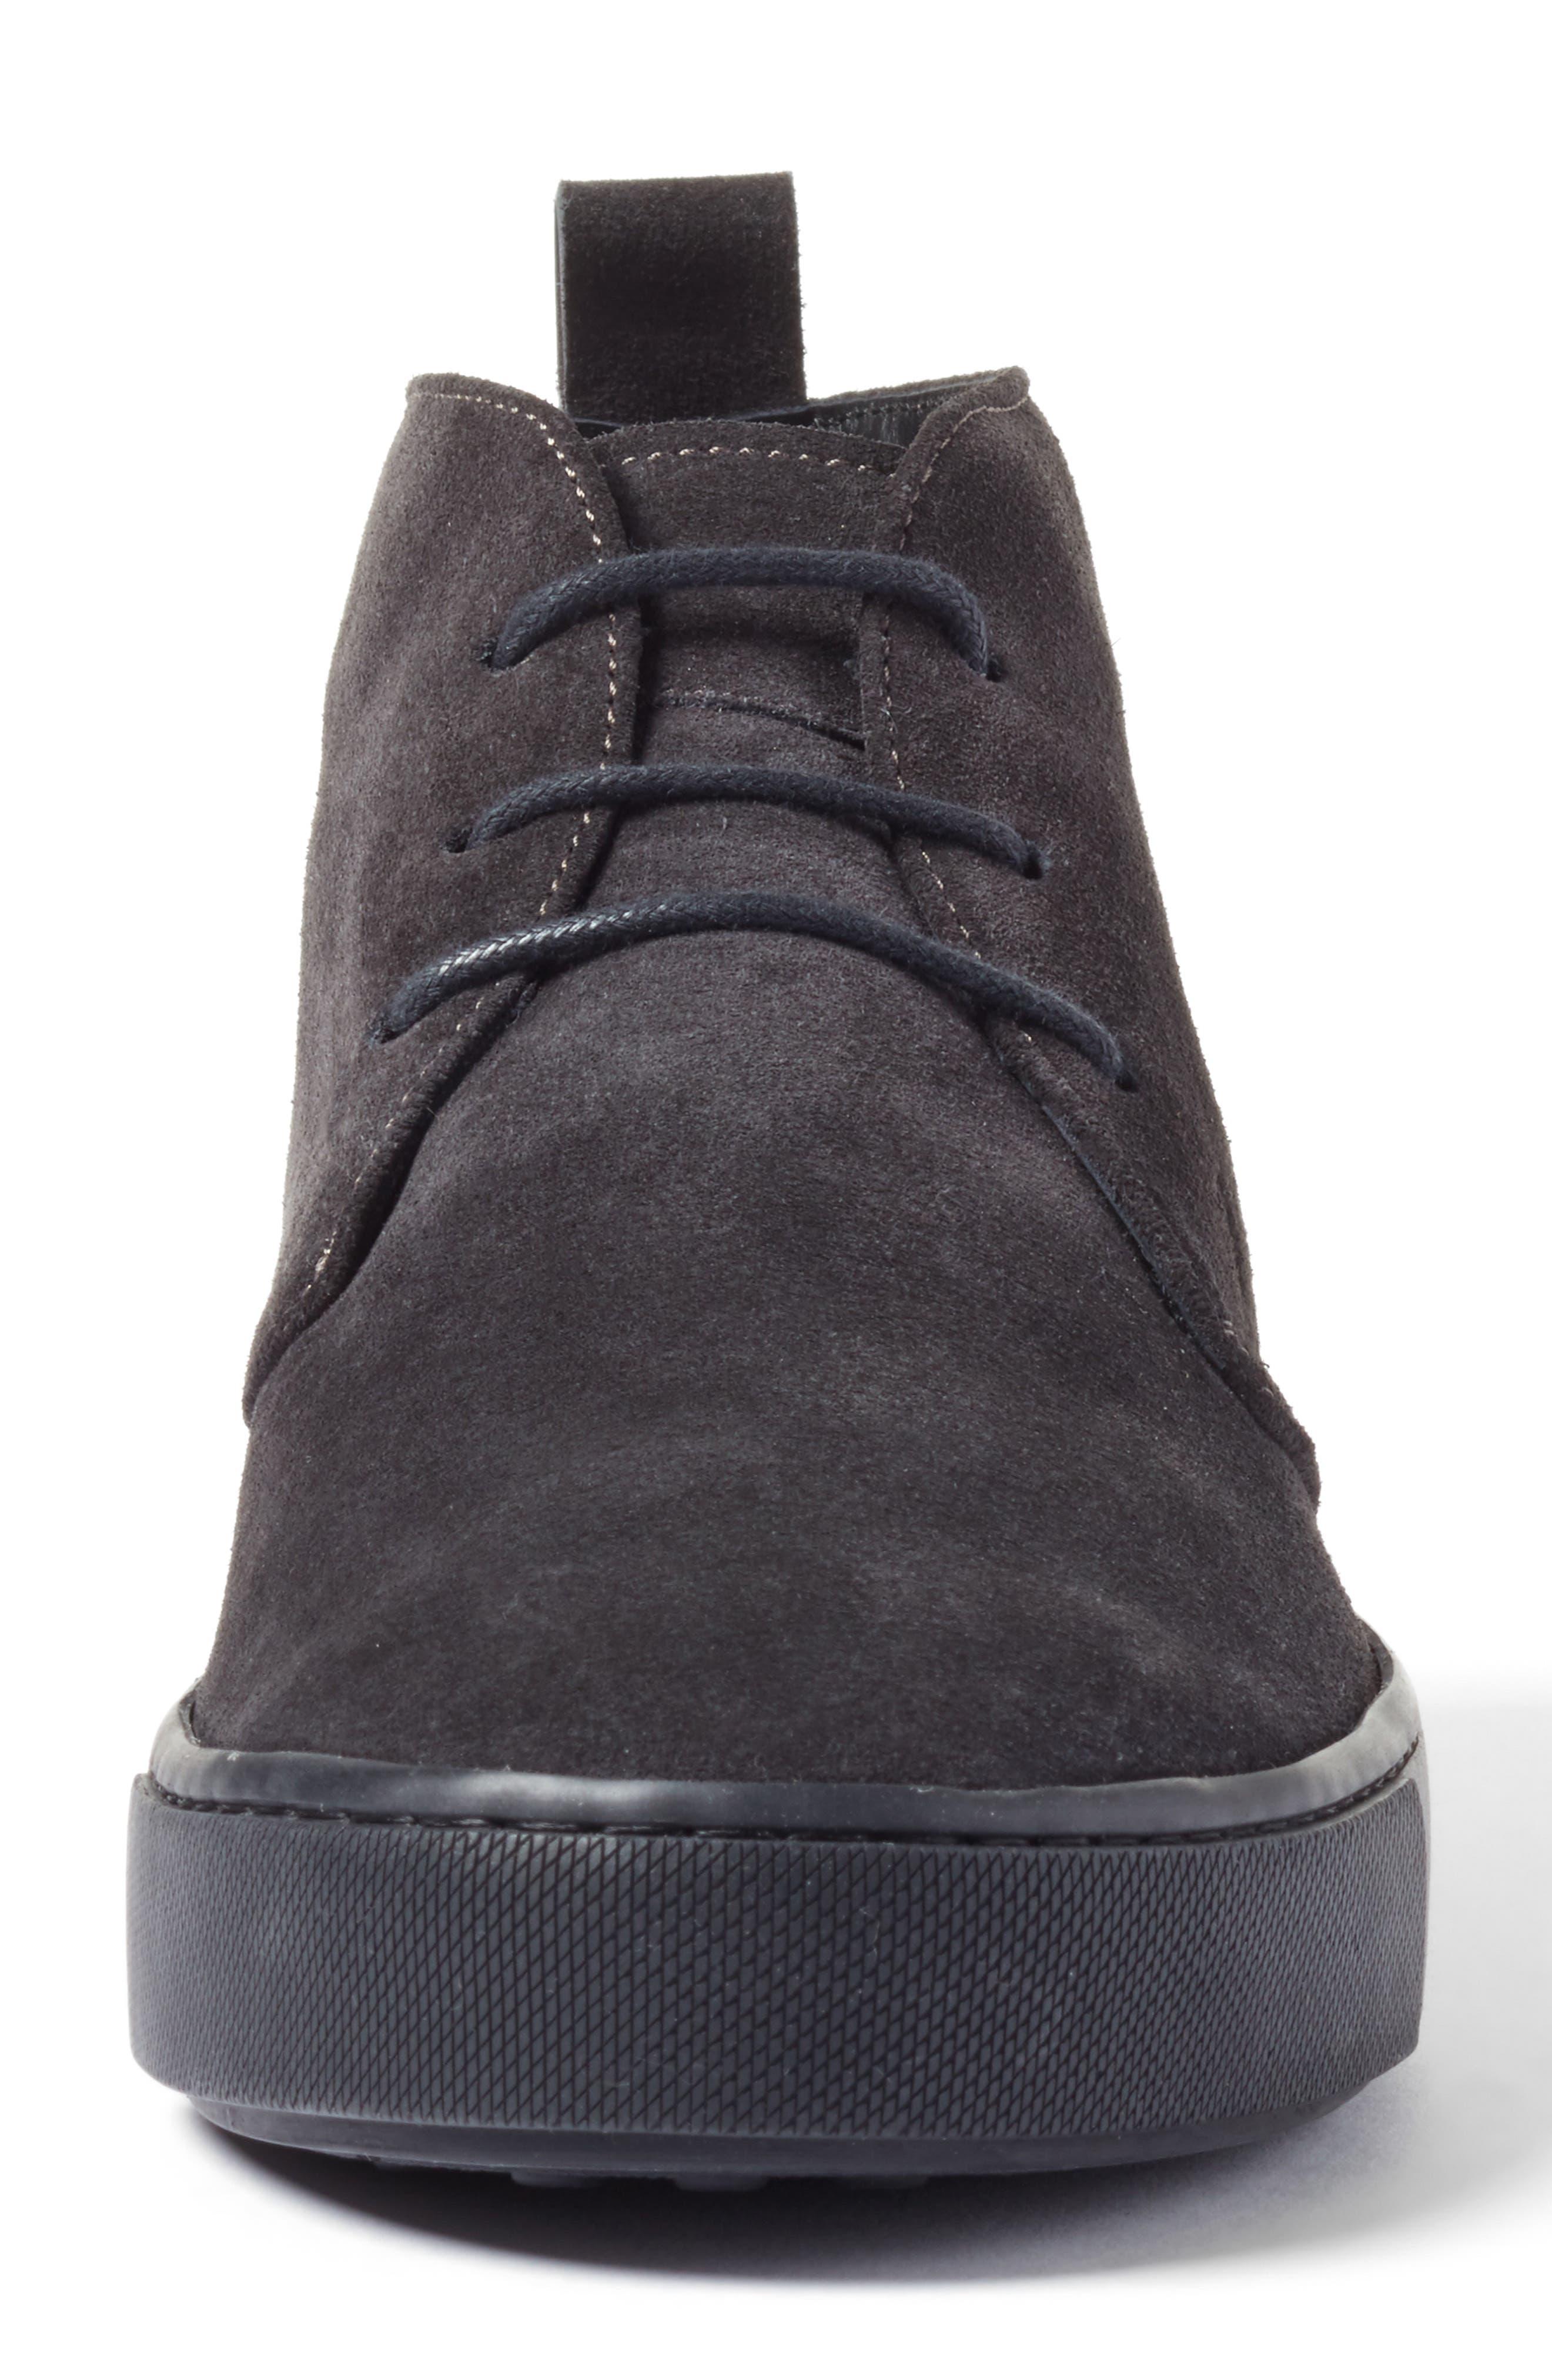 Leather Chukka Boot,                             Alternate thumbnail 4, color,                             020